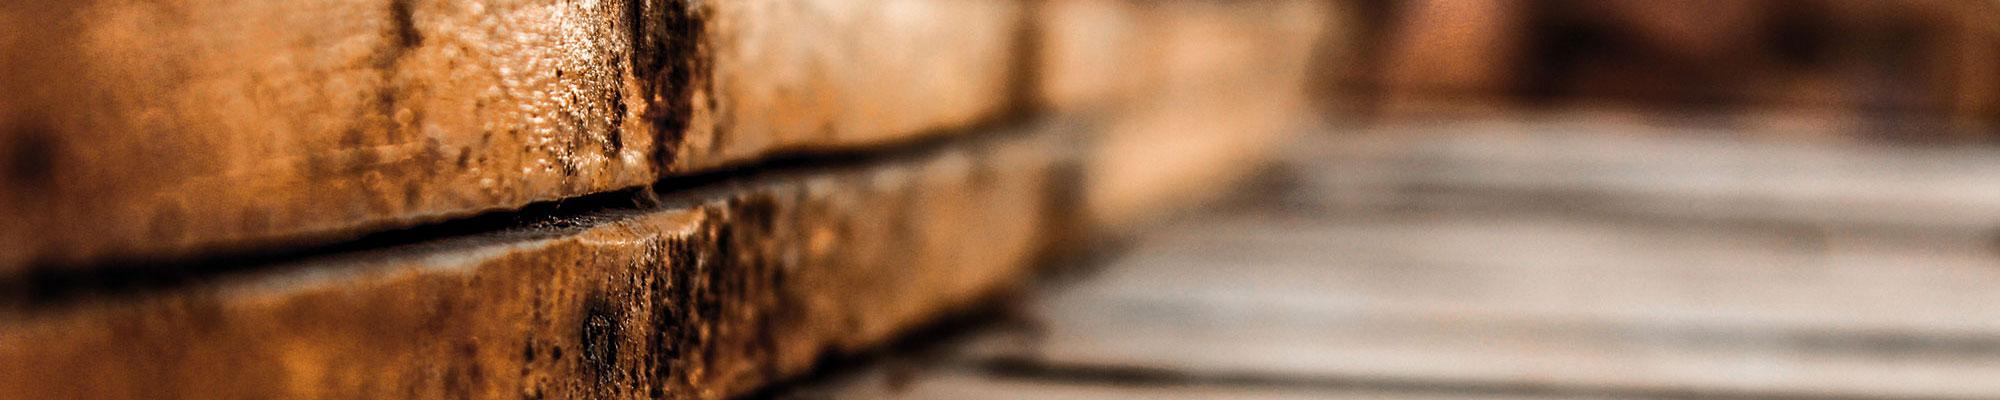 charleston woodworking school | short courses